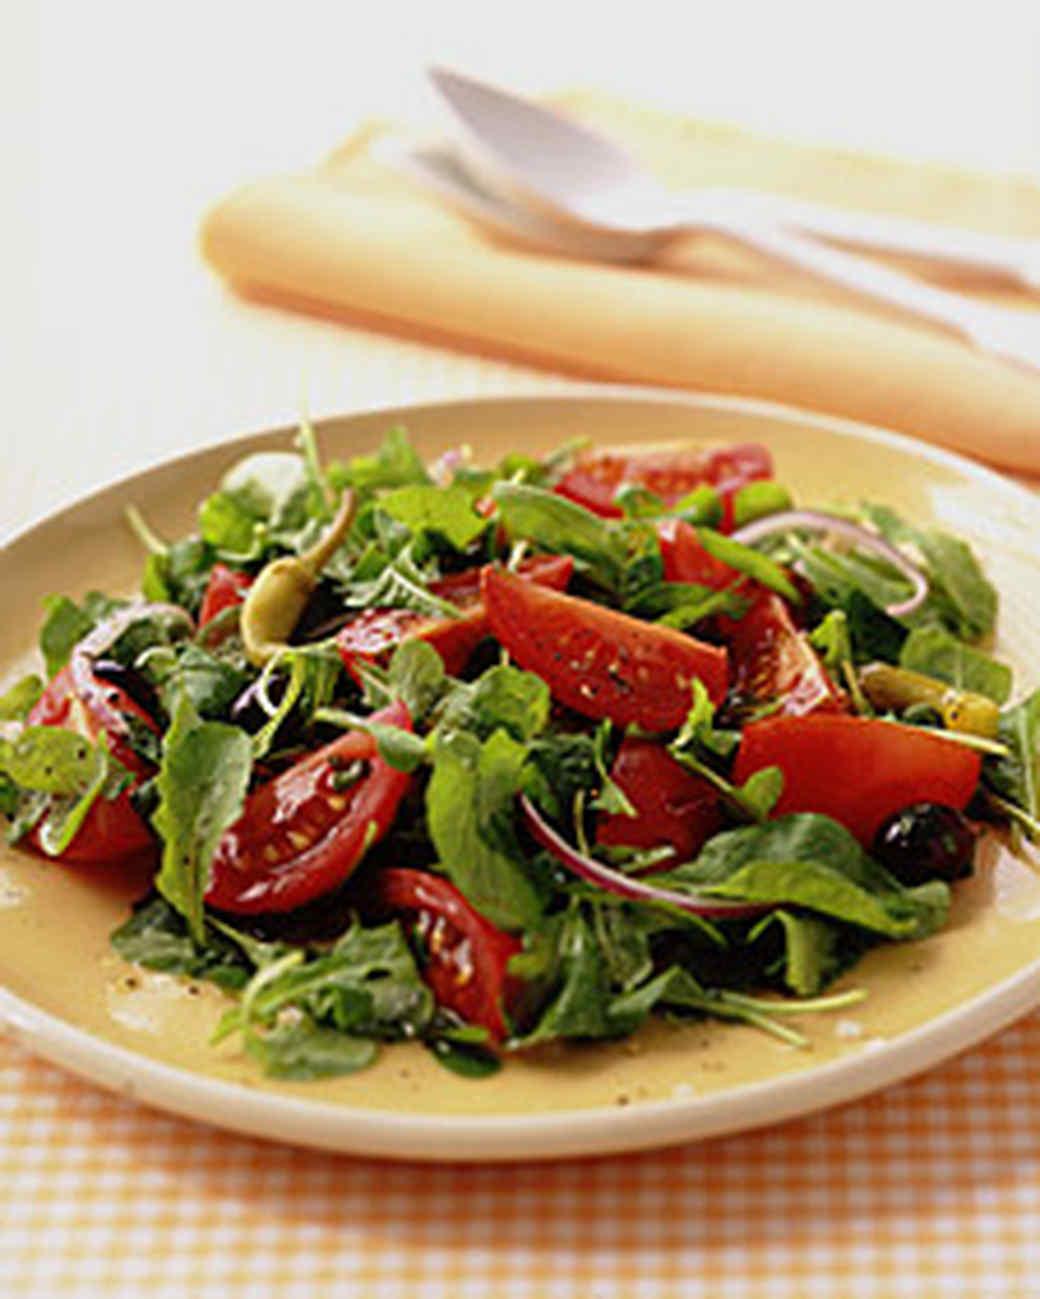 la102232_0806_salad.jpg